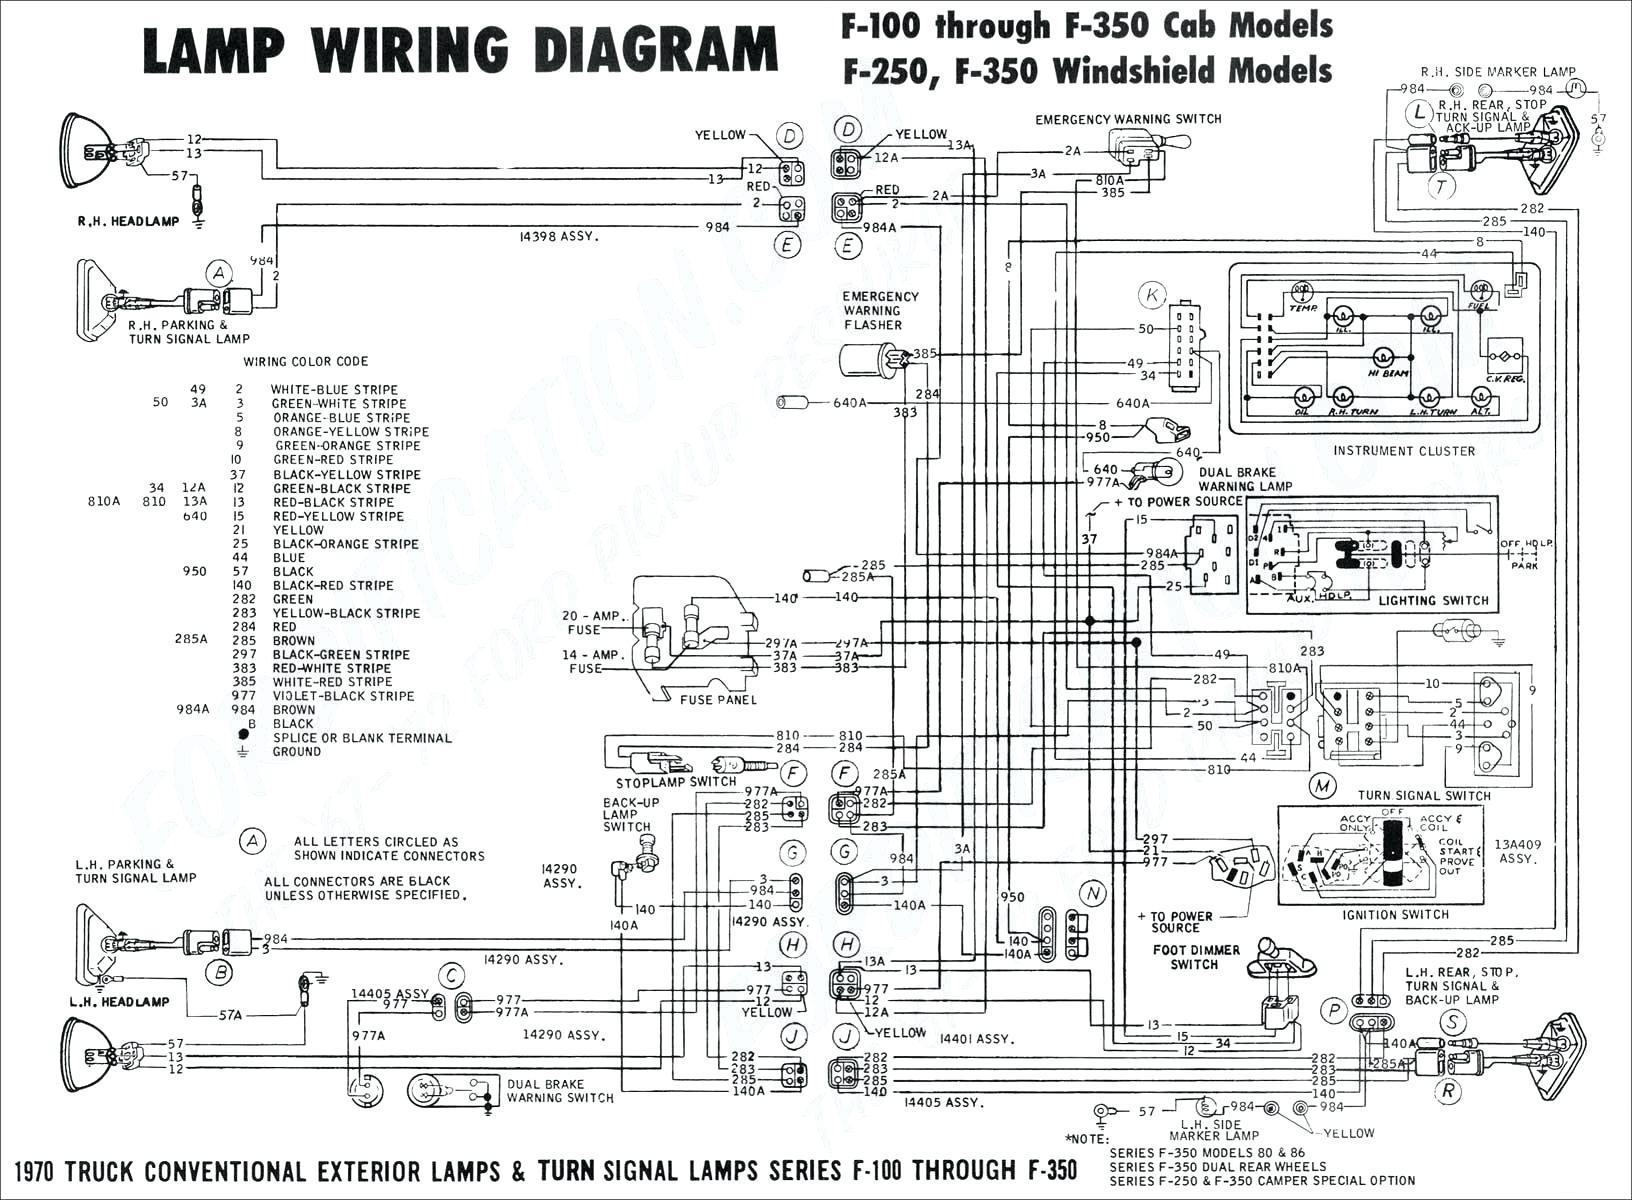 244aa F150 Trailer Light Wiring Diagram